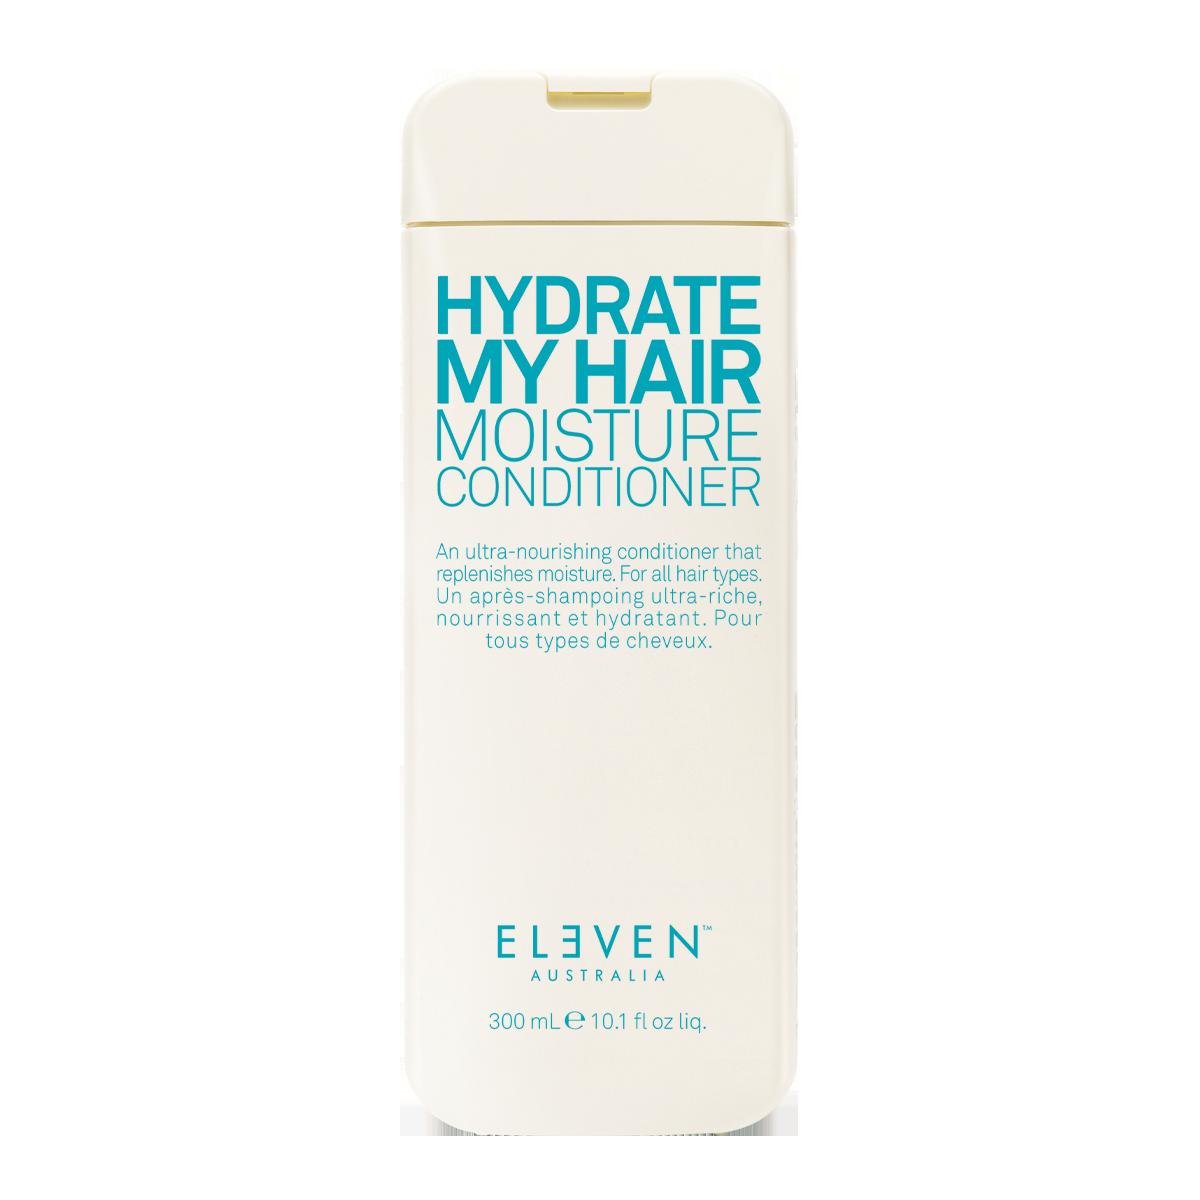 Hydrate my hair Eleven Australia